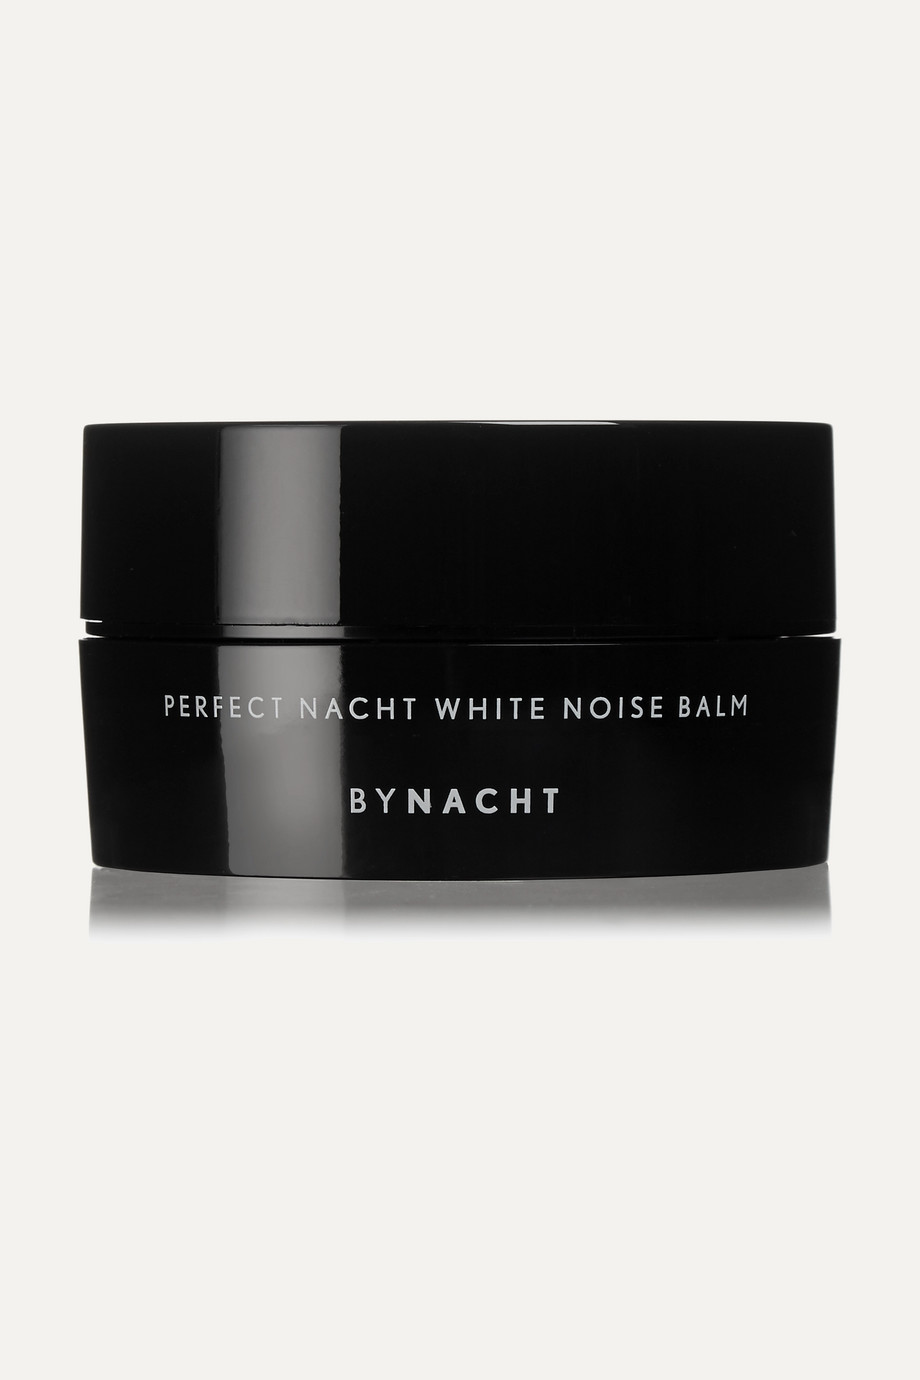 BYNACHT Perfect Nacht White Noise Balm, 15 ml